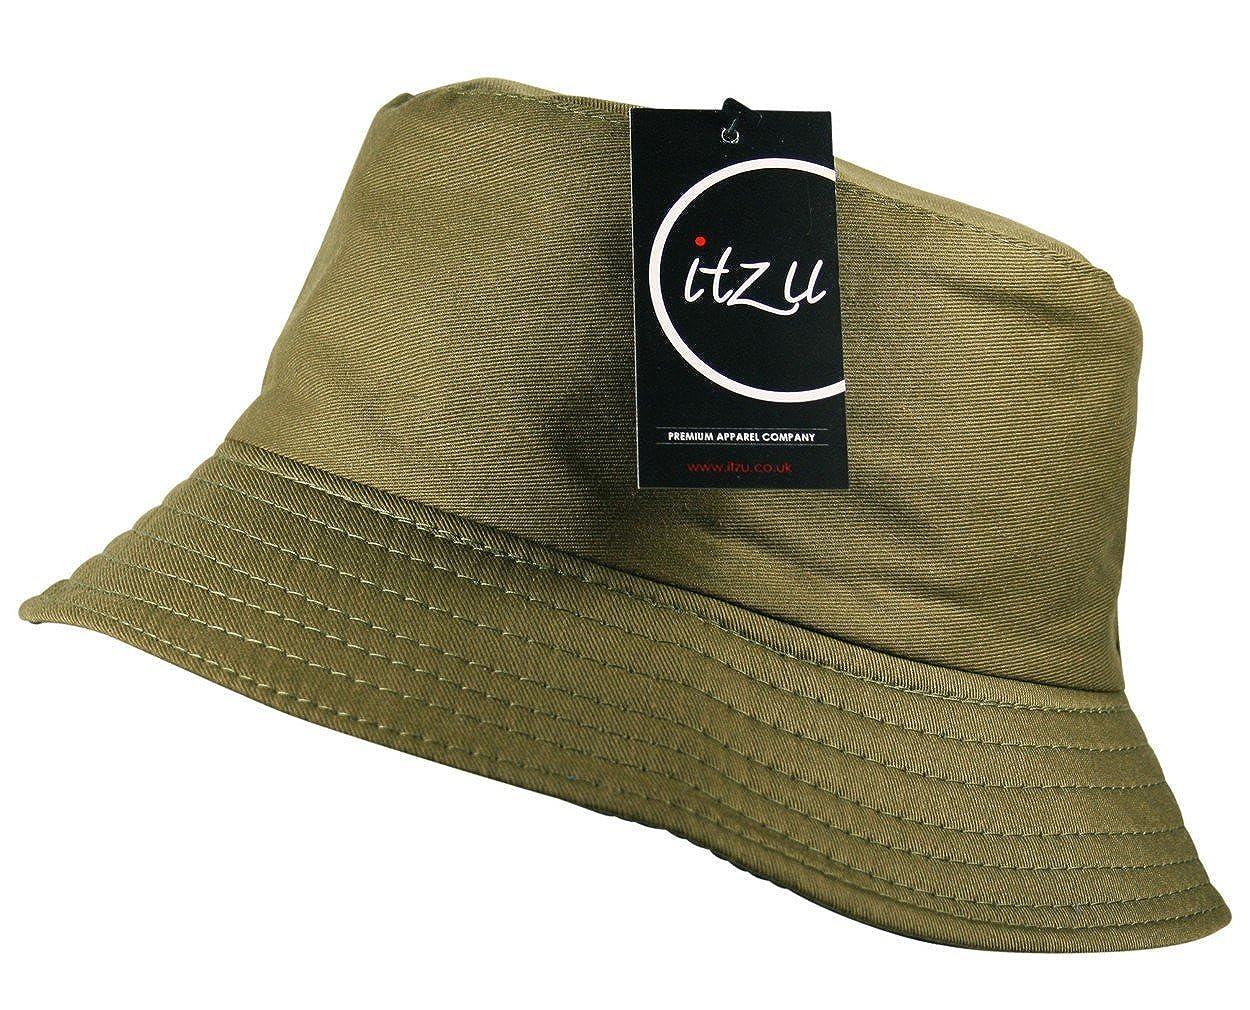 8baac82c3bb Itzu Classic Bucket Bush Hat Plain Adult Unisex  1540987643-202469 ...